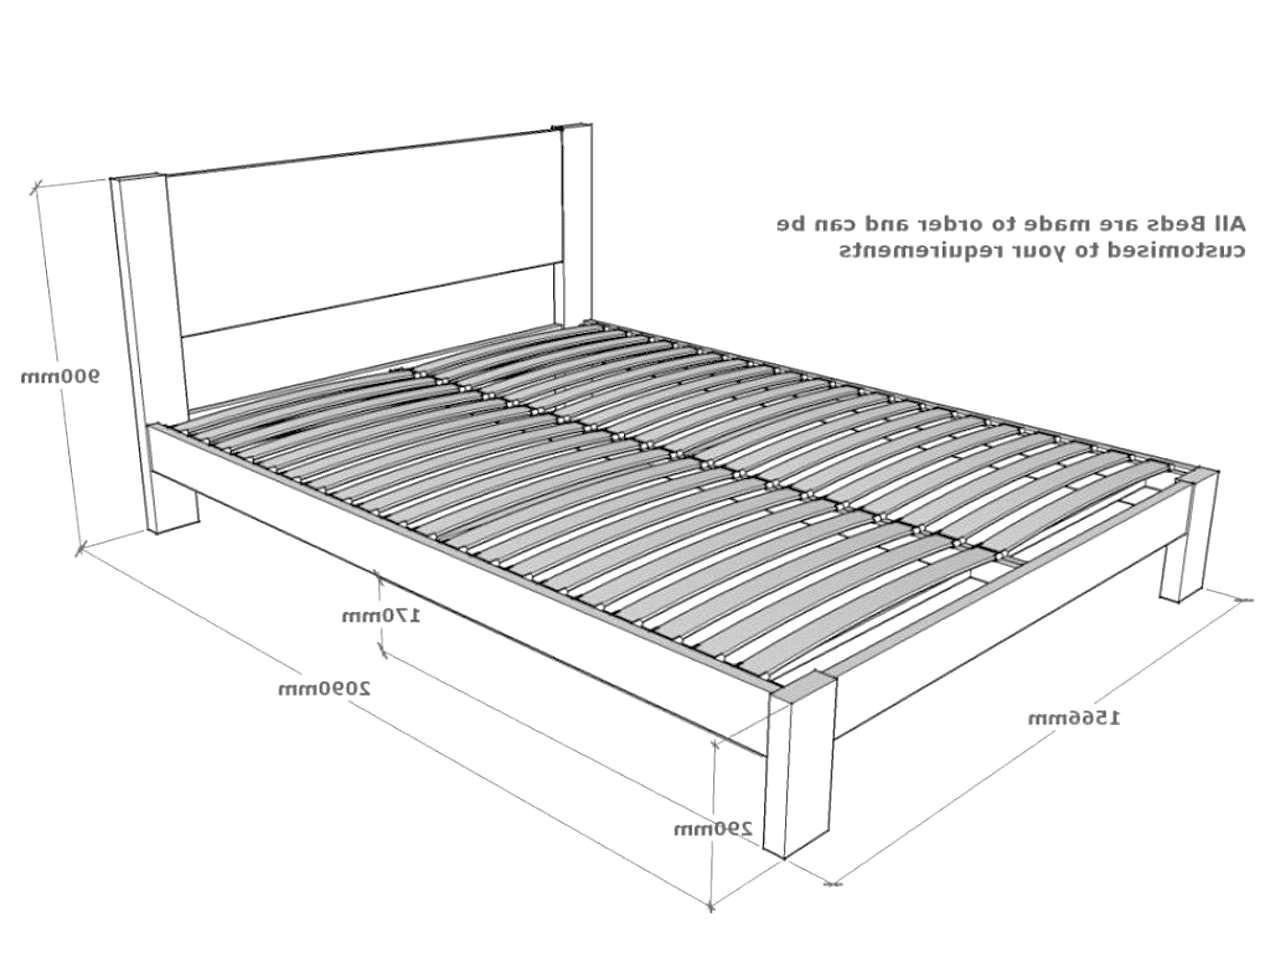 alaskan king bed frame inspirational dimensions queen bed twenty first century representation kmart of alaskan king